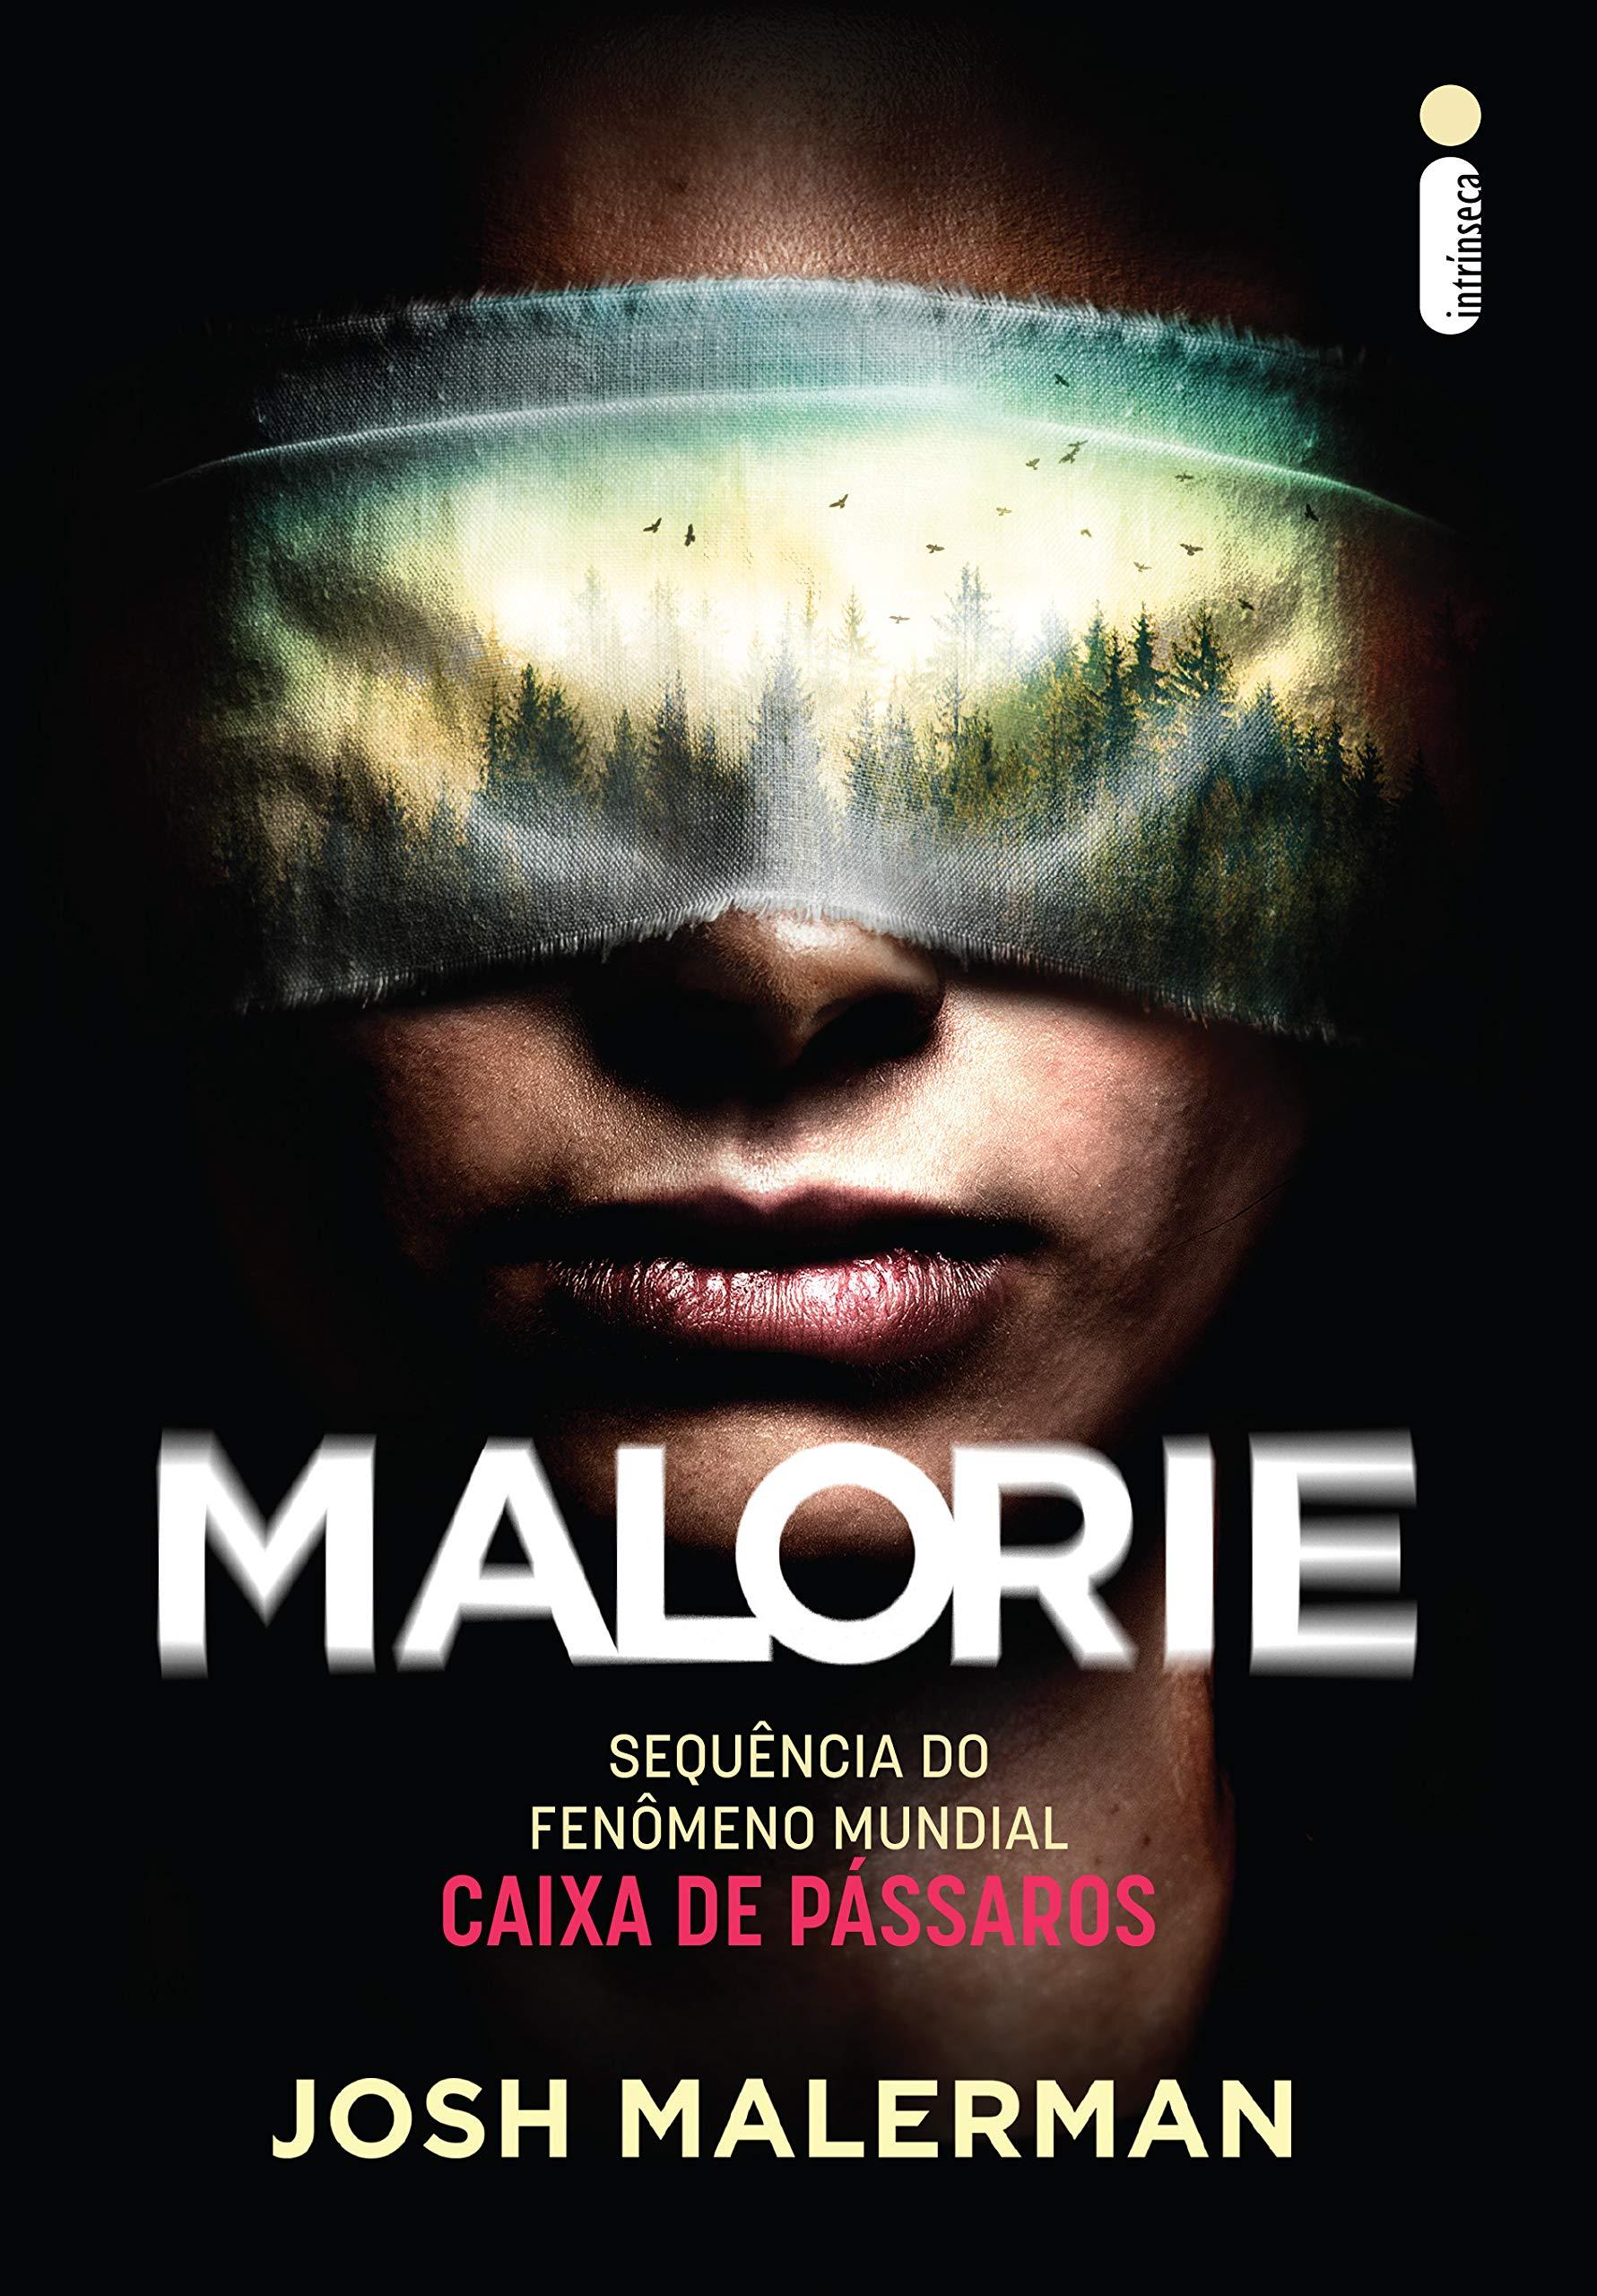 Malorie - Sequência de Caixa de Pássaro